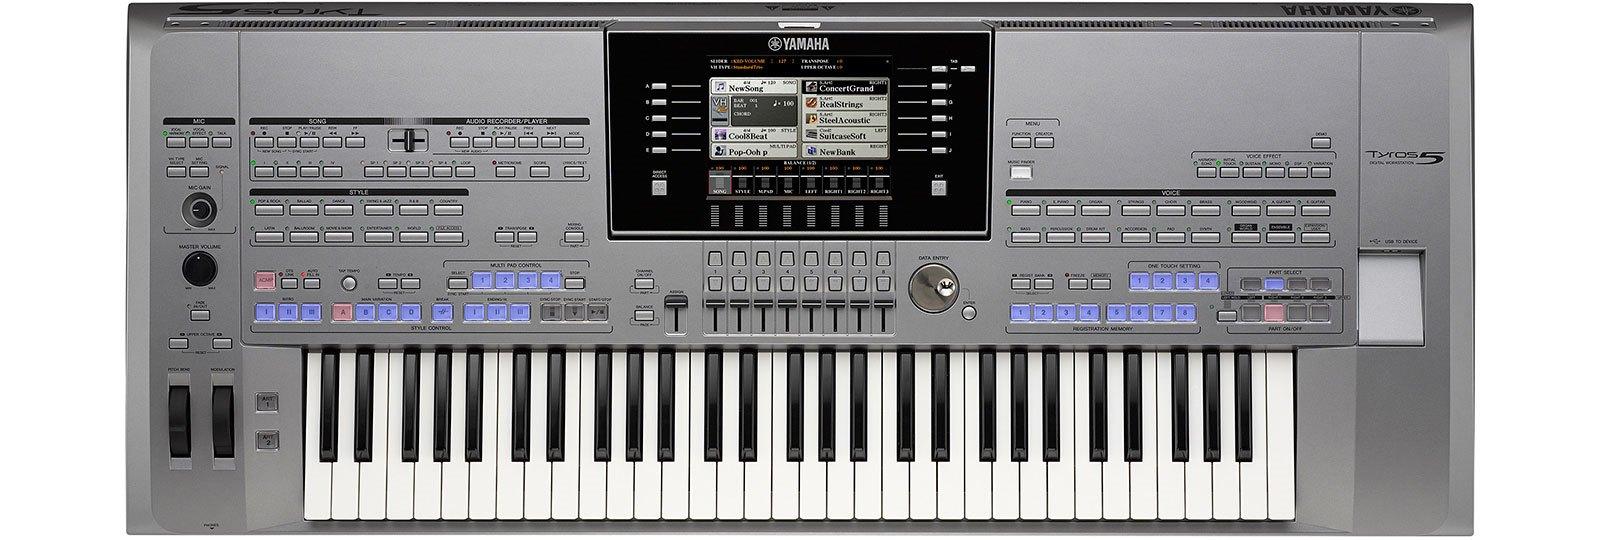 Organ Yamaha Tyross 5